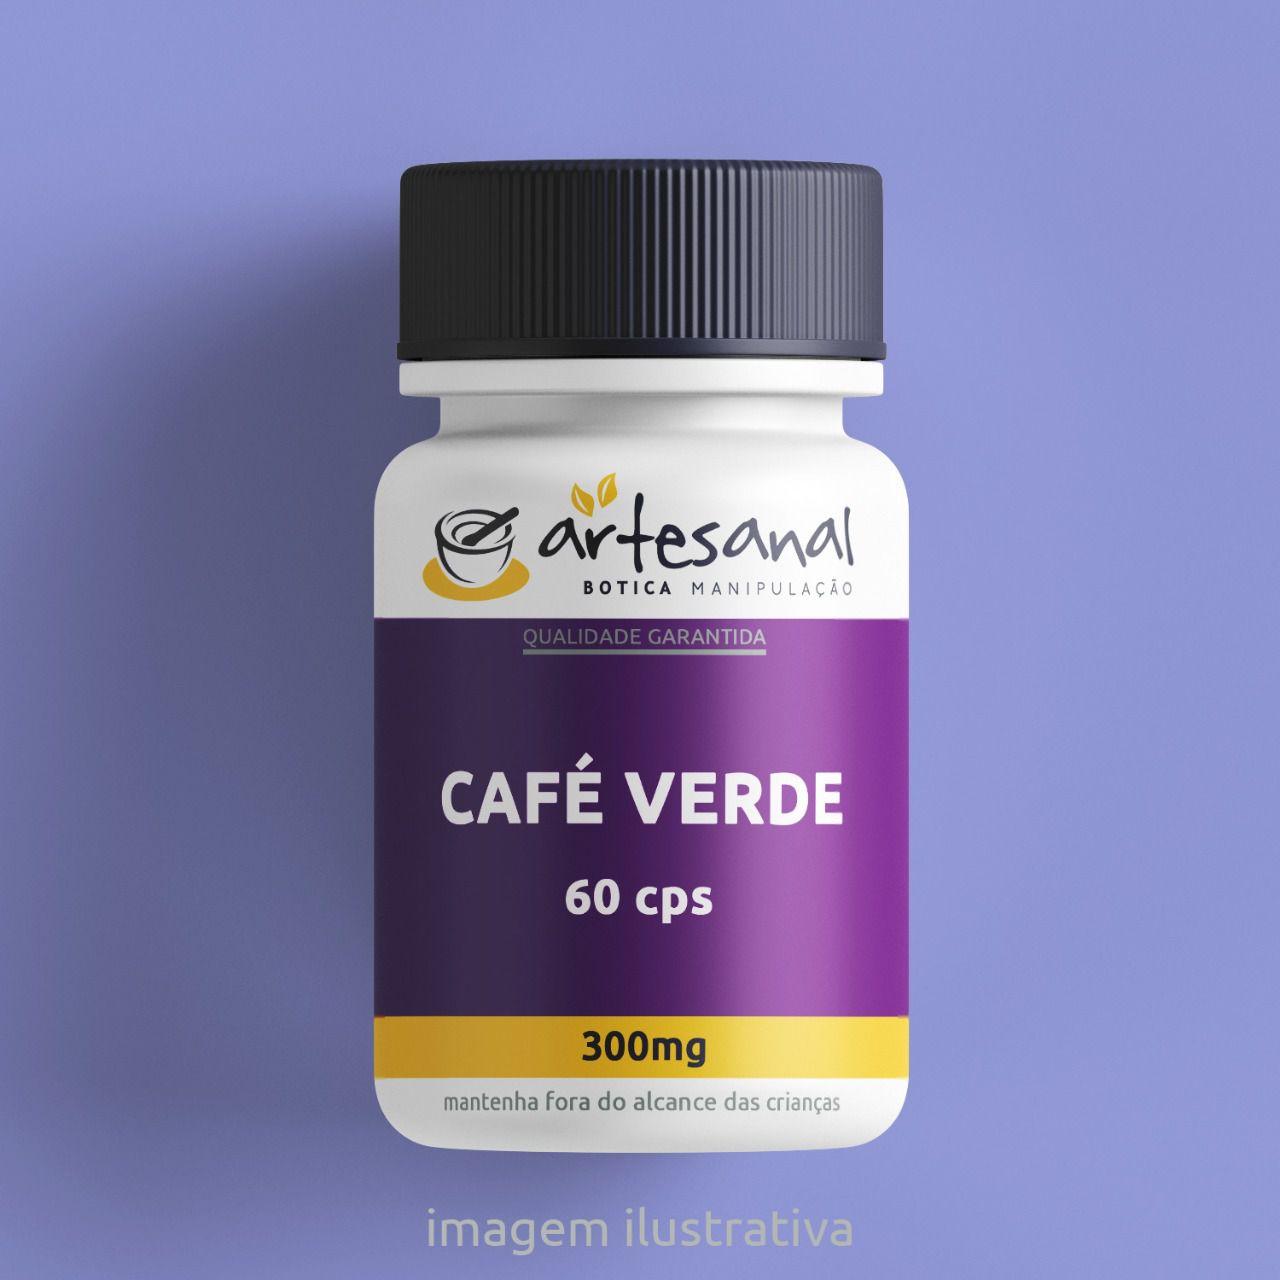 Café Verde - 60 Cps